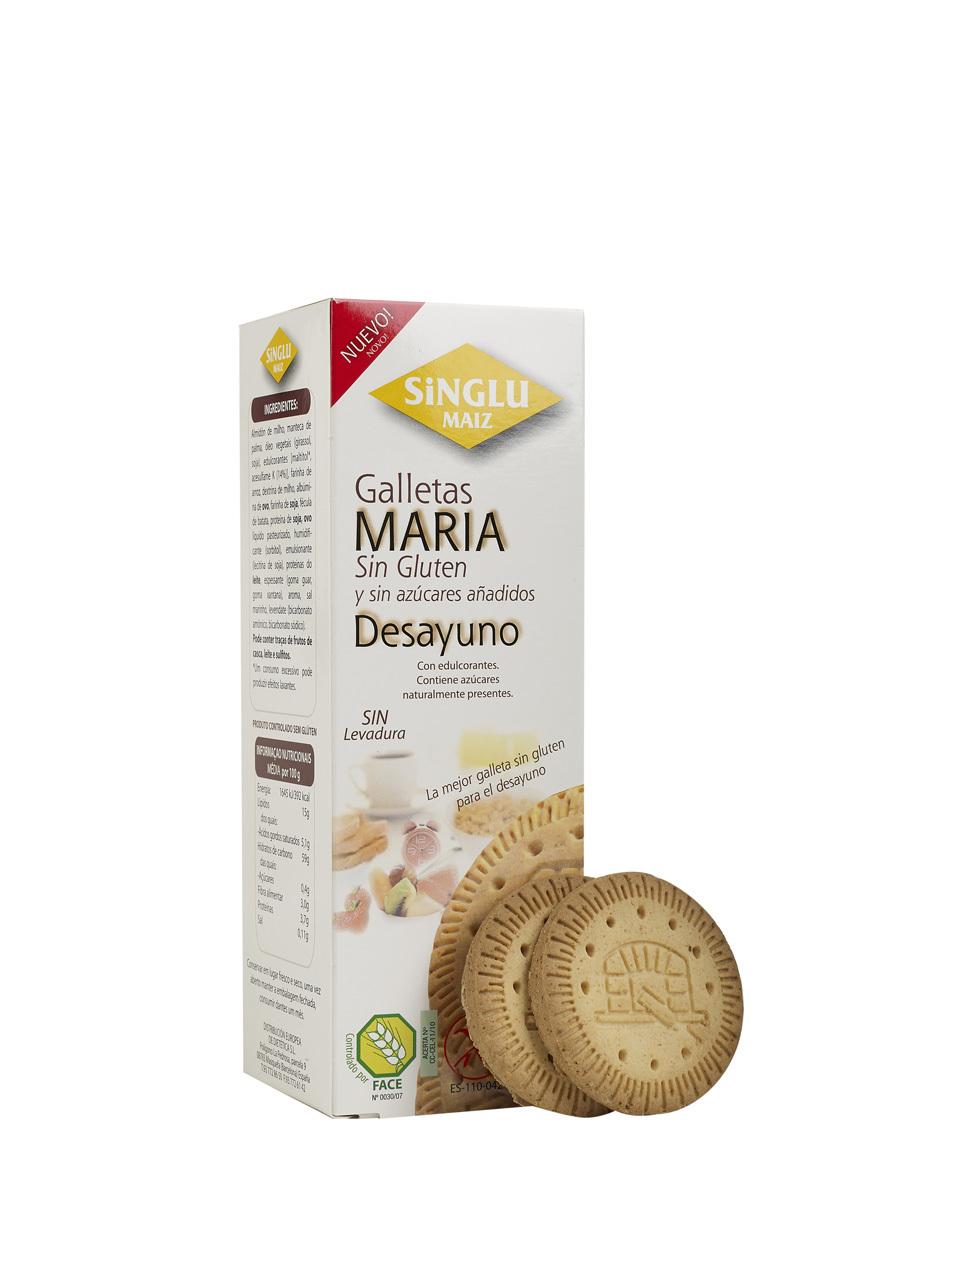 GALLETA MARIA DESAYUNO S/AZ 200GR SINGLU MAIZ en Biovegalia